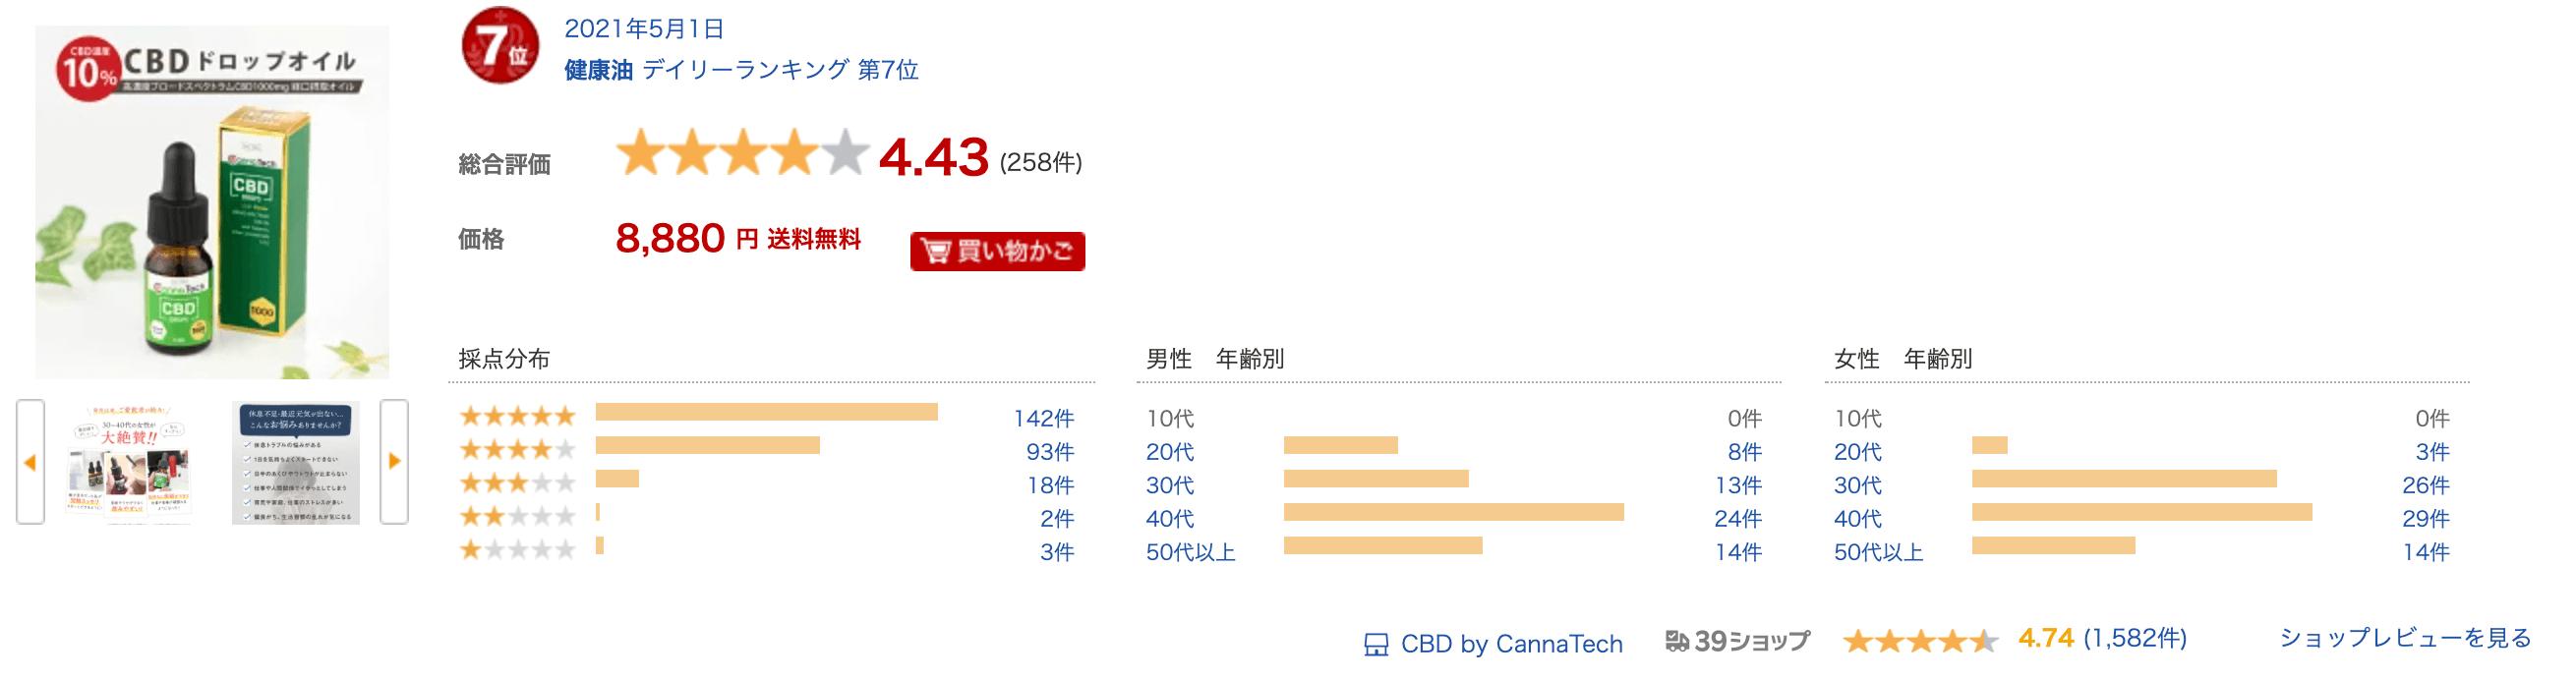 CannaTech(キャナテック)の10%オイルの口コミ